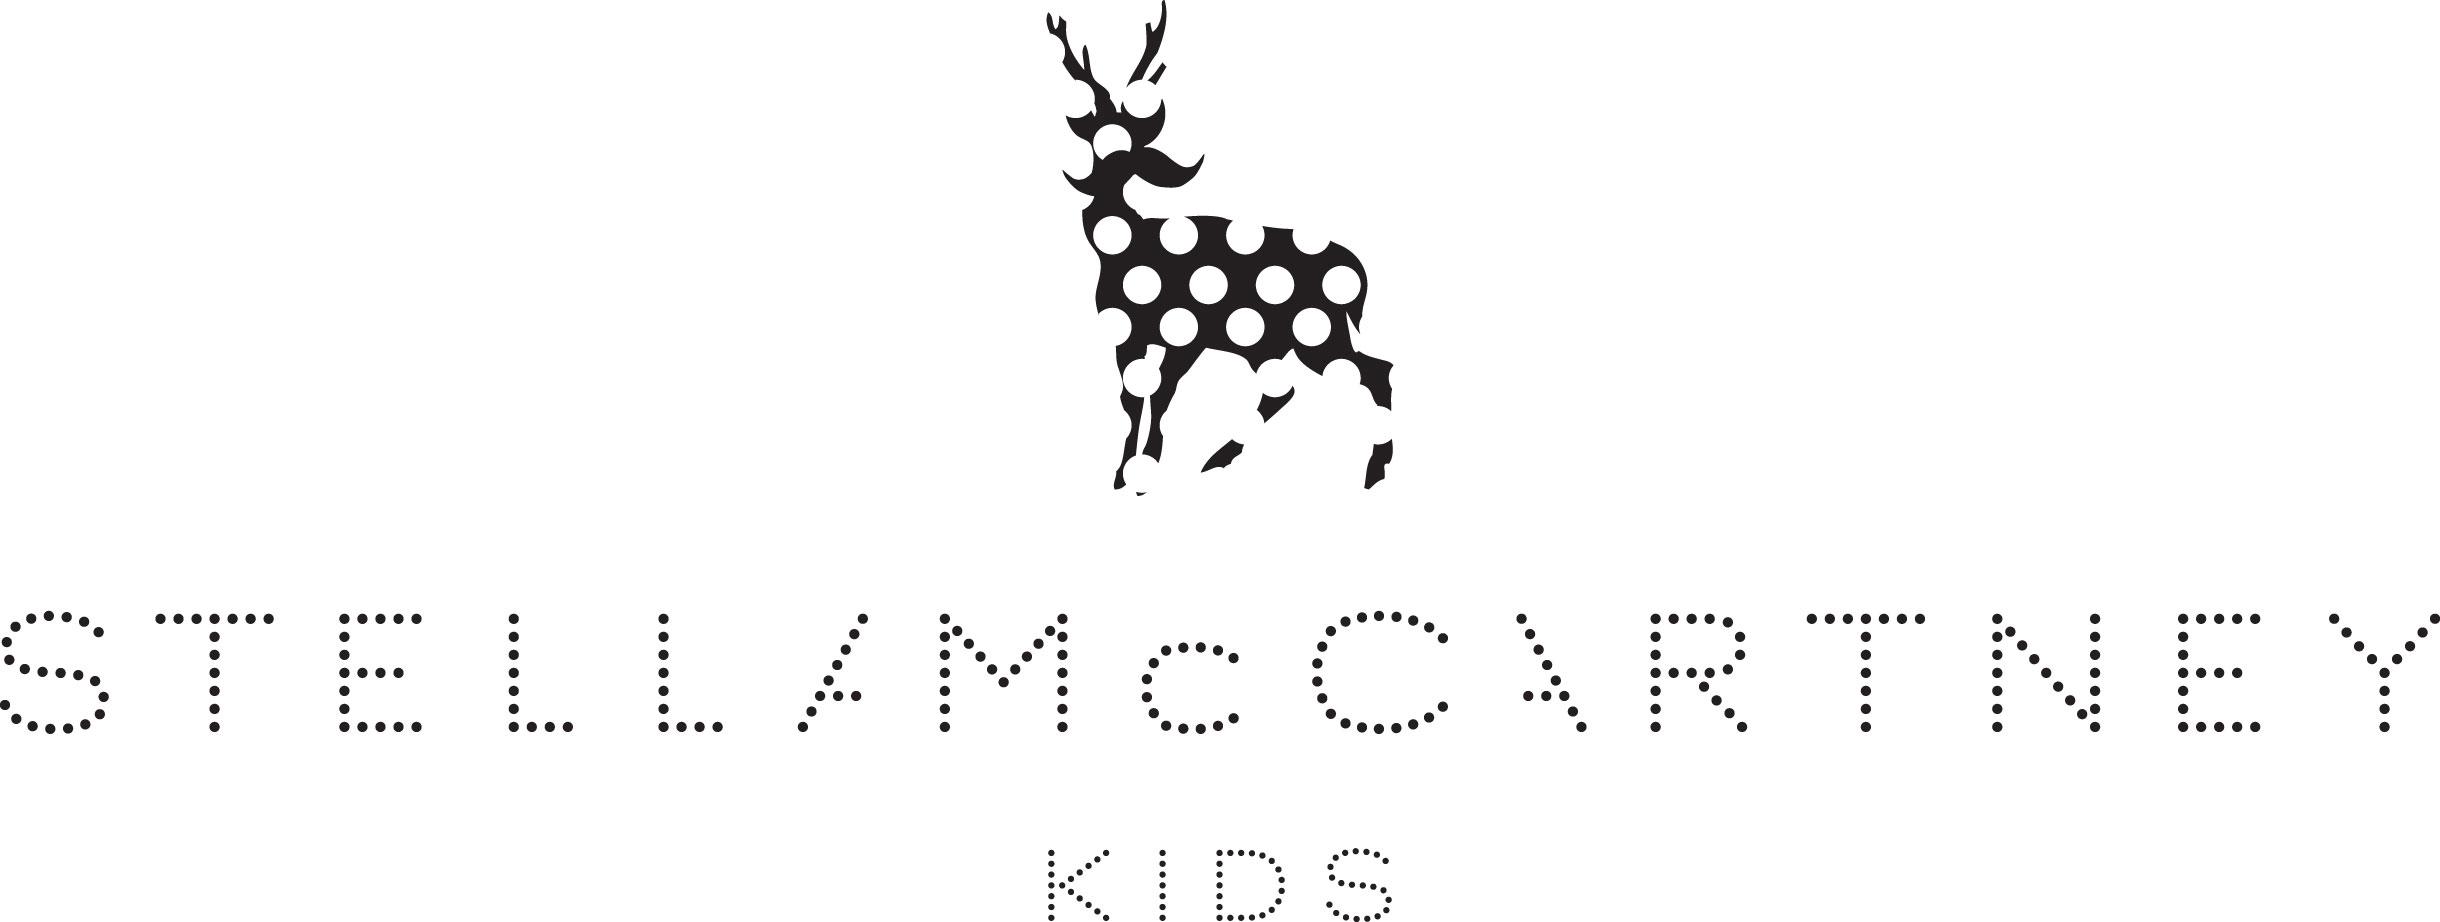 SMC_KIDS_PRIMARY_LOCKUP_CMYK_MONO_DRAFT_